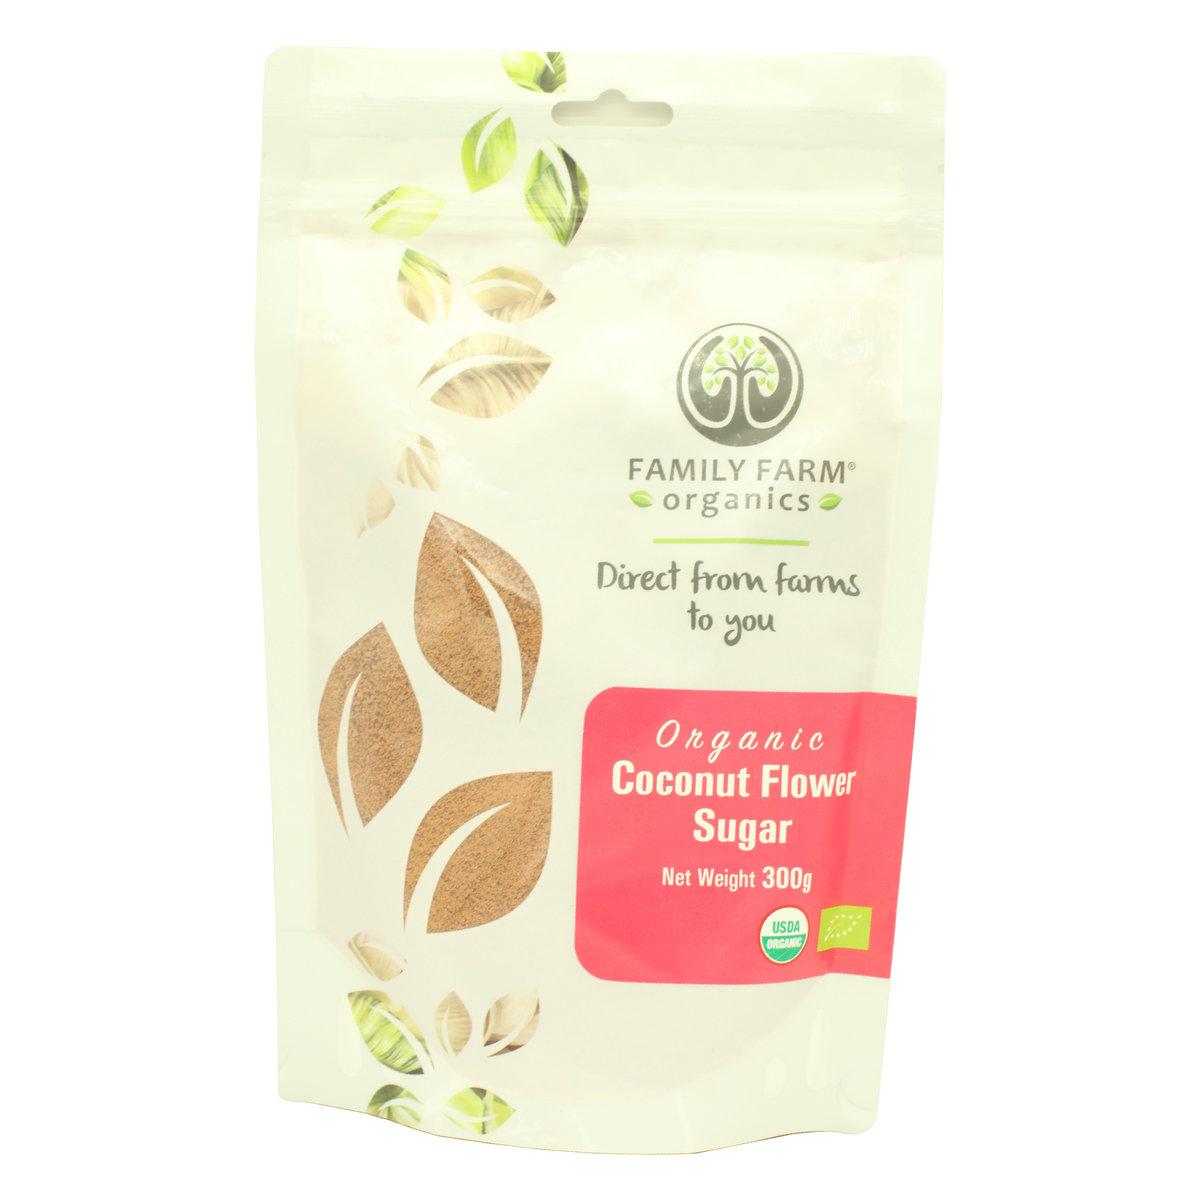 Organic Coconut Flower Sugar (Low GI, Weight loss)